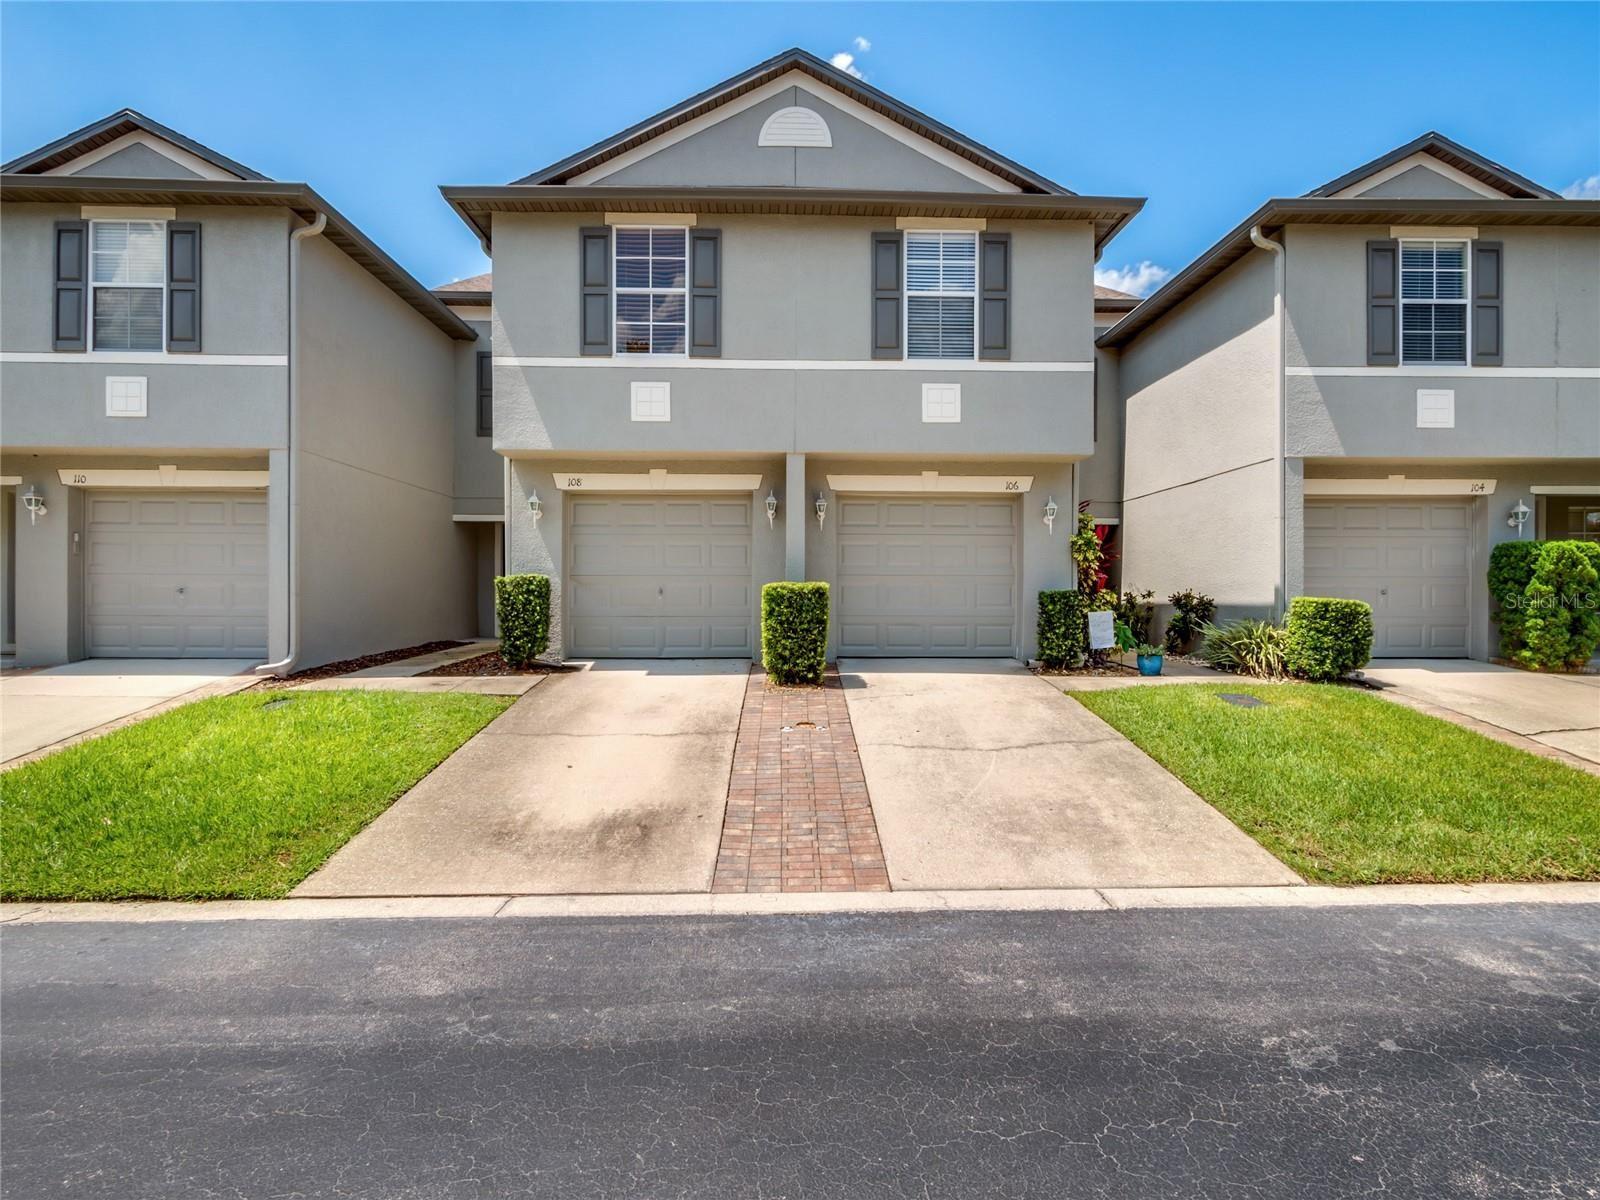 108 HERITAGE PARK STREET, Winter Springs, FL 32708 - #: O5960365